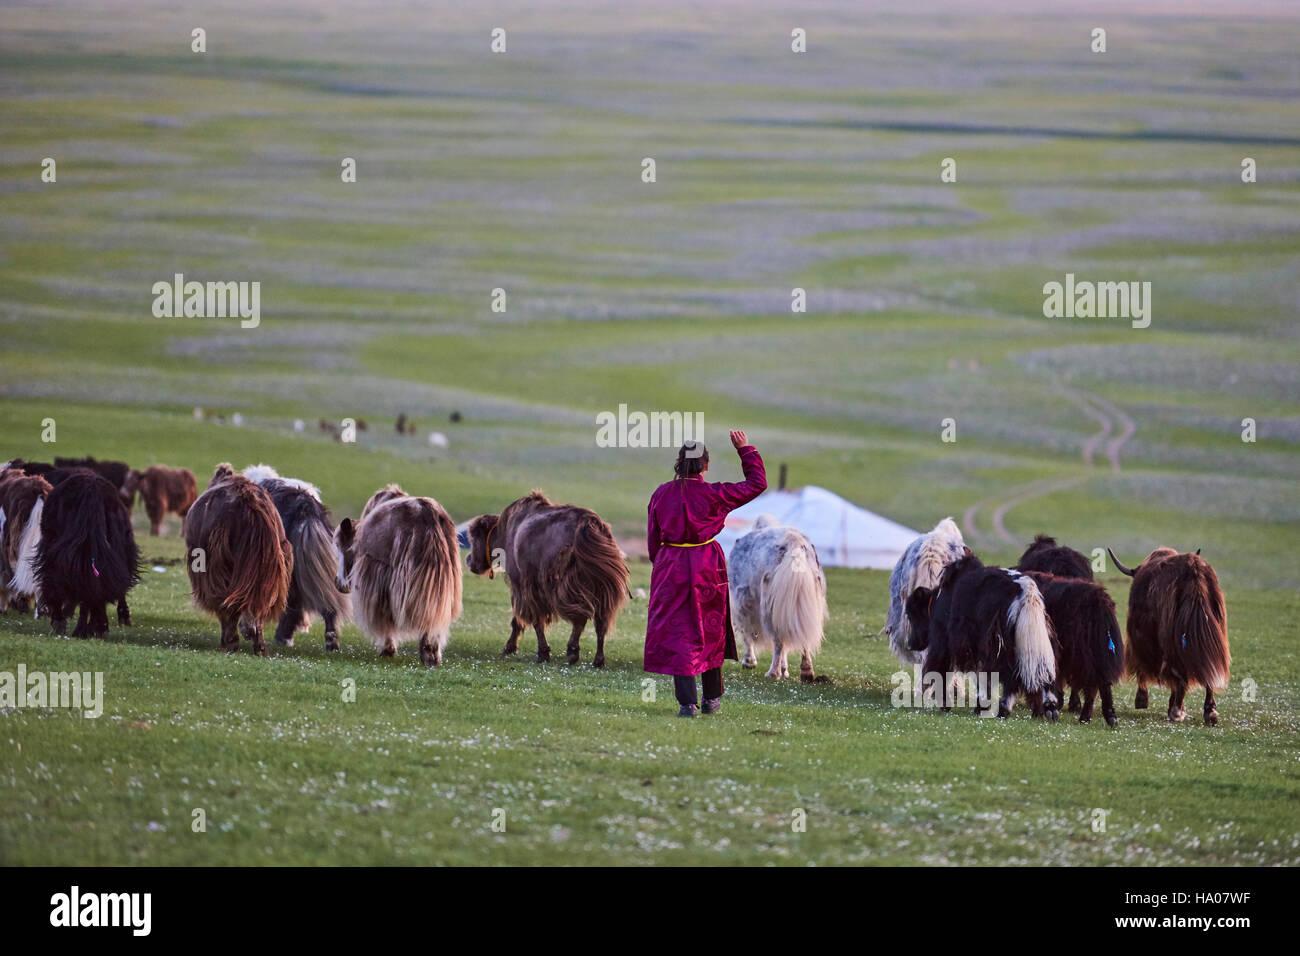 Mongolia independientes de Asia Central Asia travel destino turístico mundial de cultura palabra destino yak Imagen De Stock